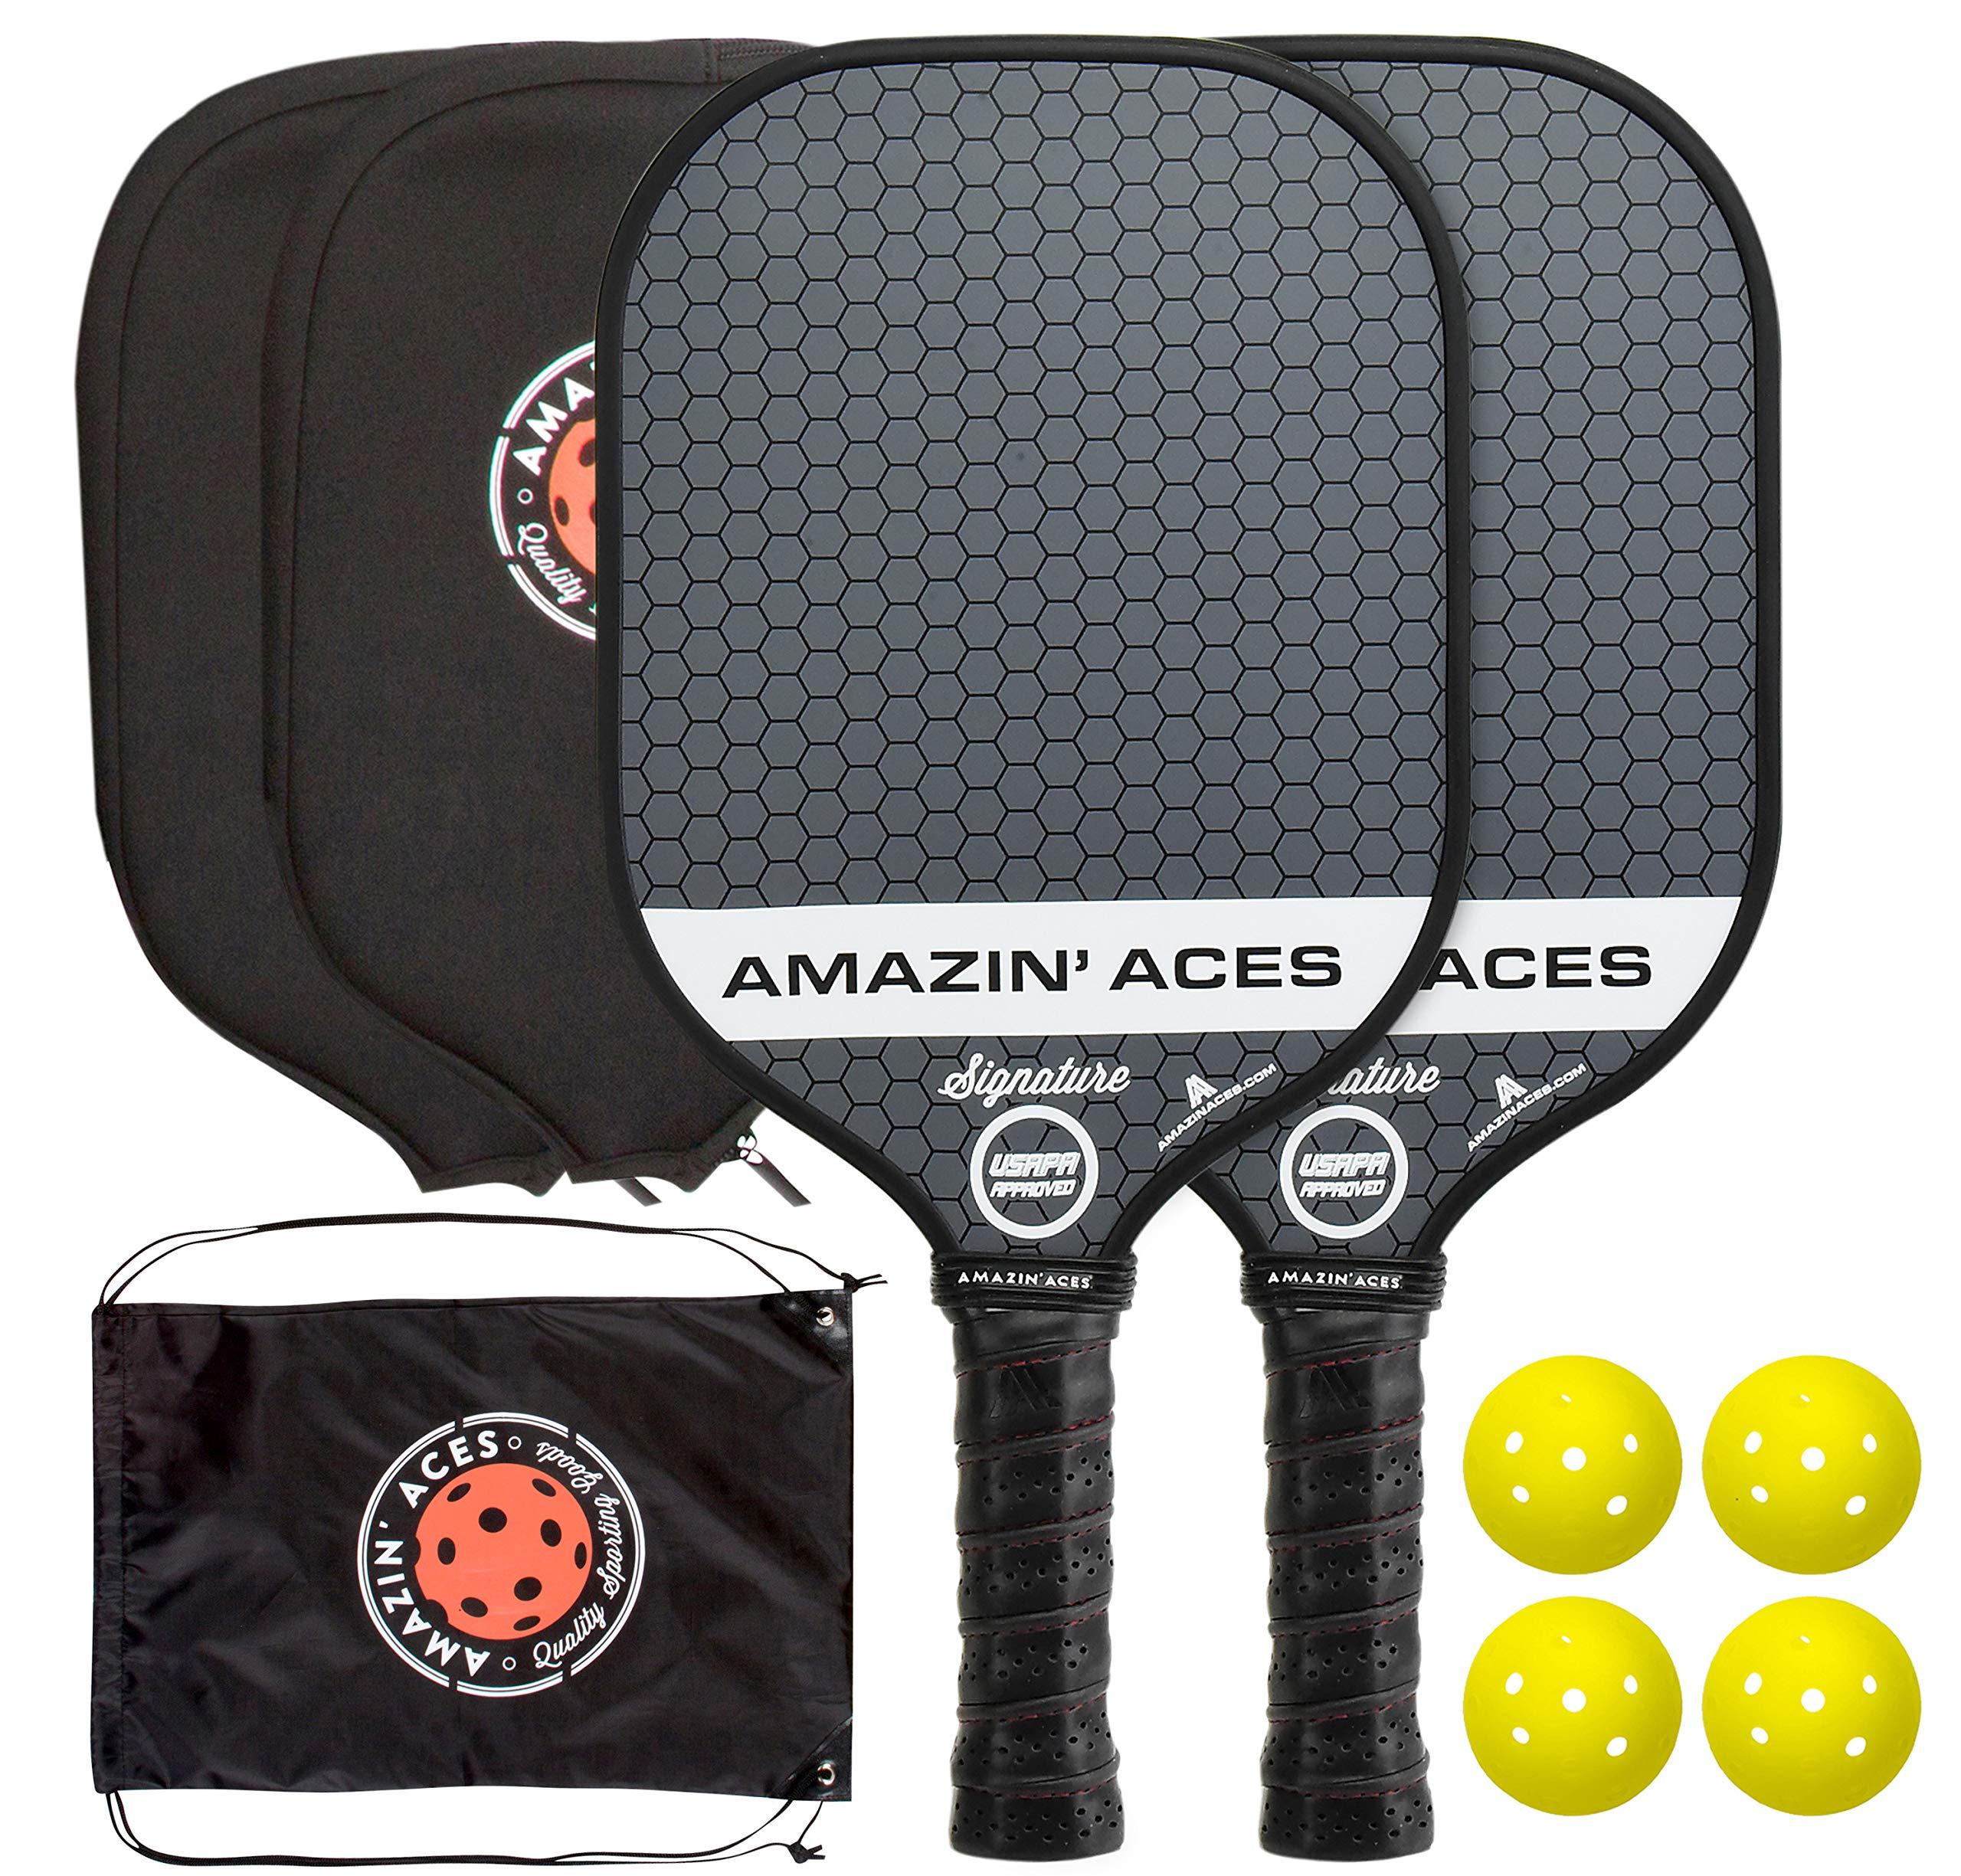 Amazin Aces Signature Pickleball Paddle Set USAPA App -5K1X